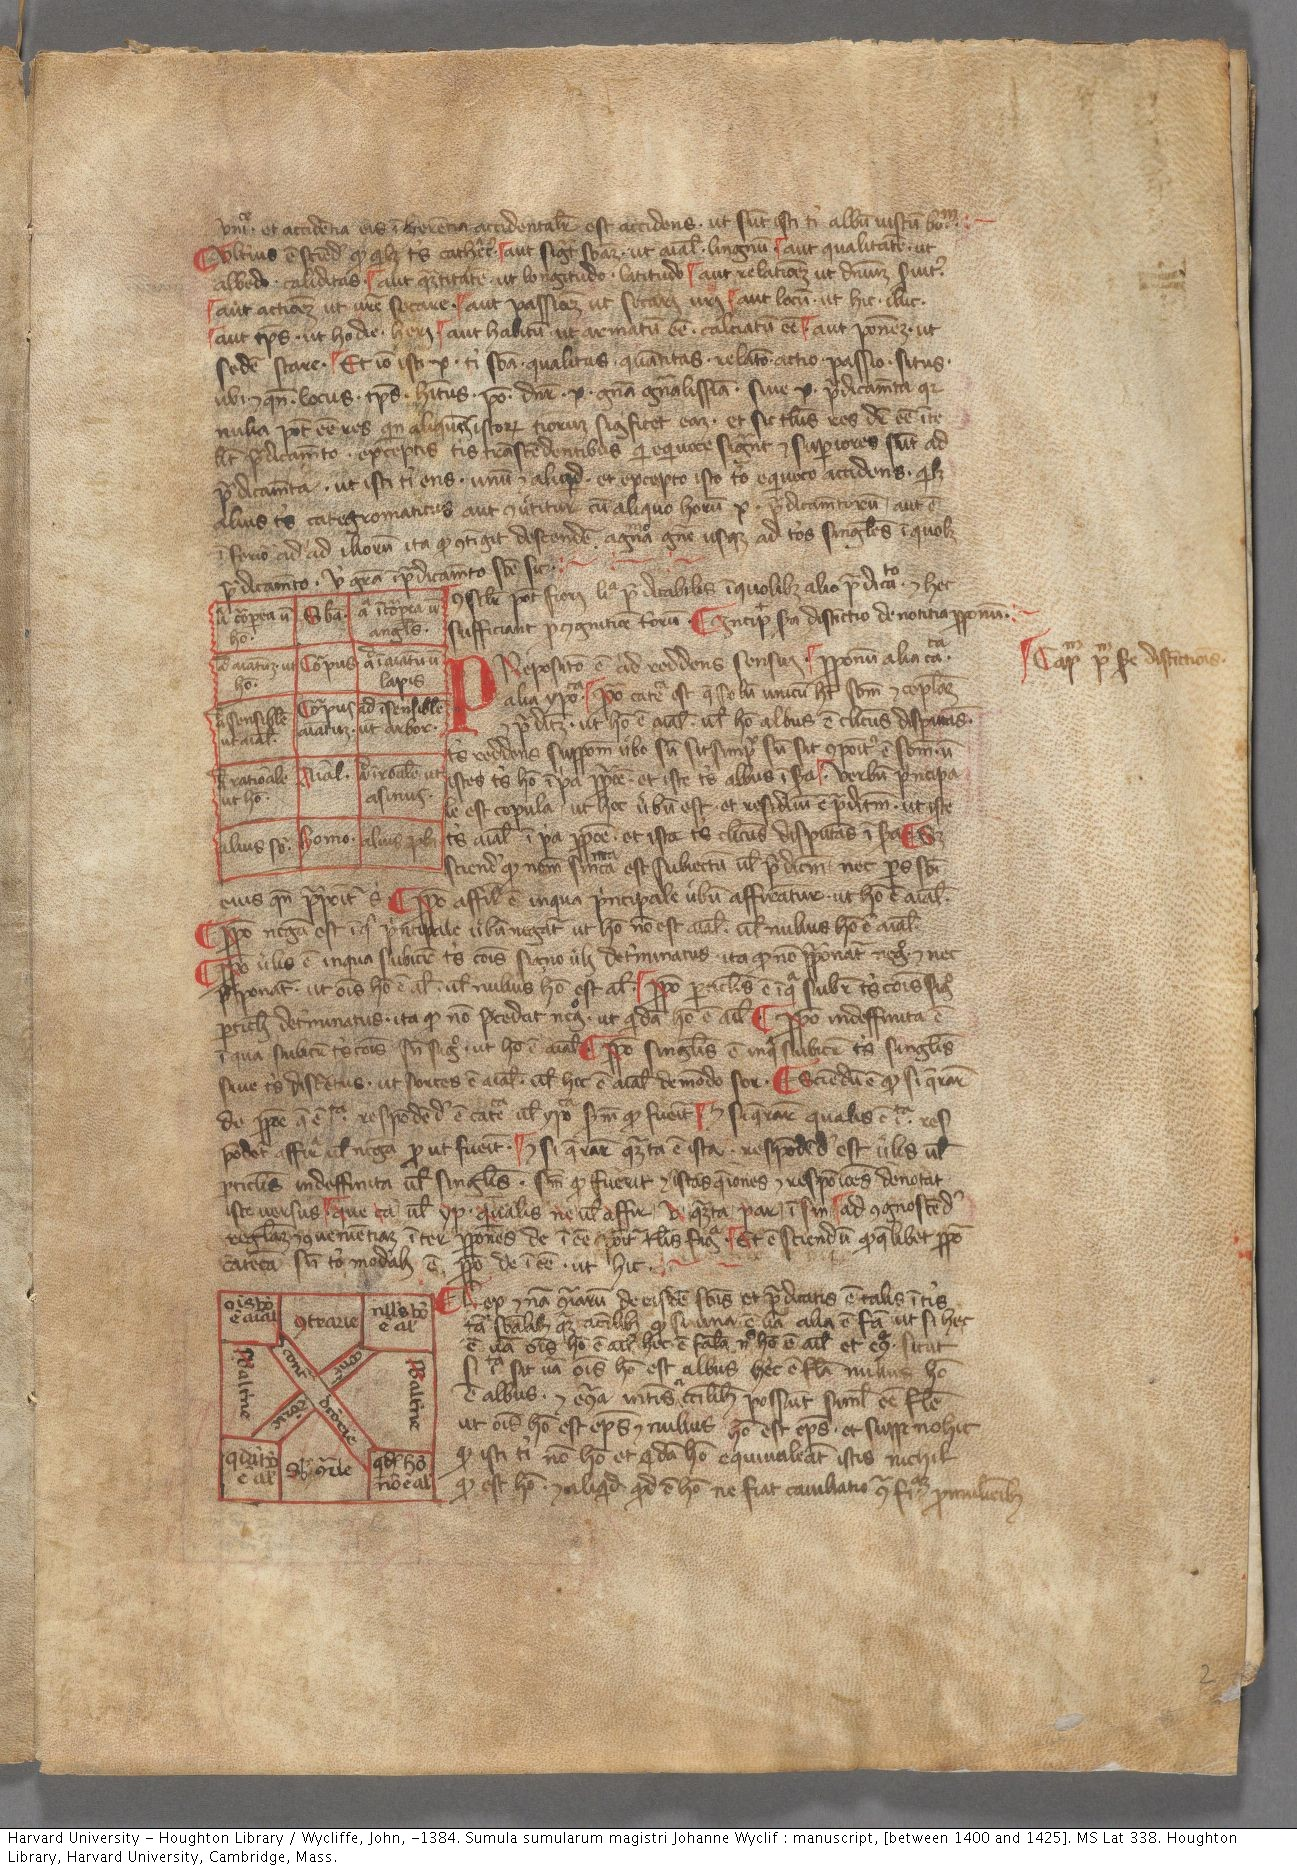 Wycliffe, John, -1384. Sumula sumularum magistri Johanne Wyclif : manuscript, [between 1400 and 1425]. MS Lat 338